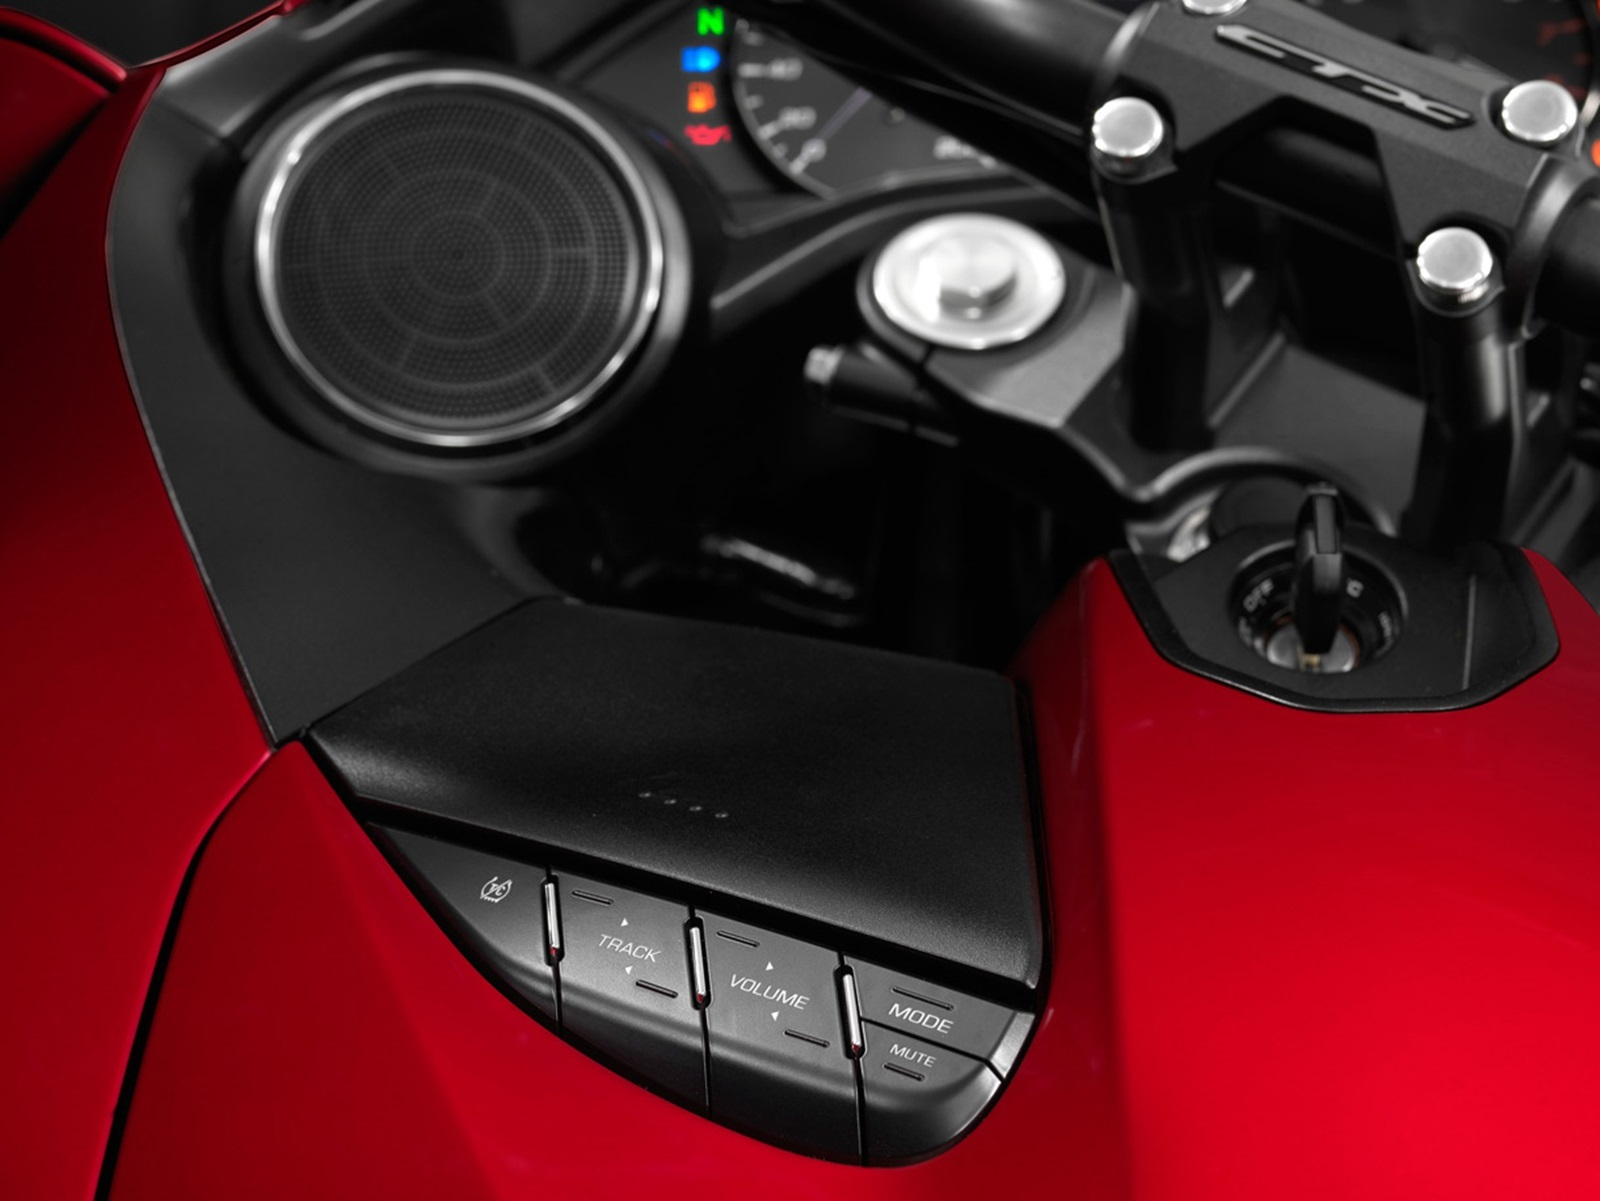 Foto de Honda VTX 1300 en detalle (16/20)